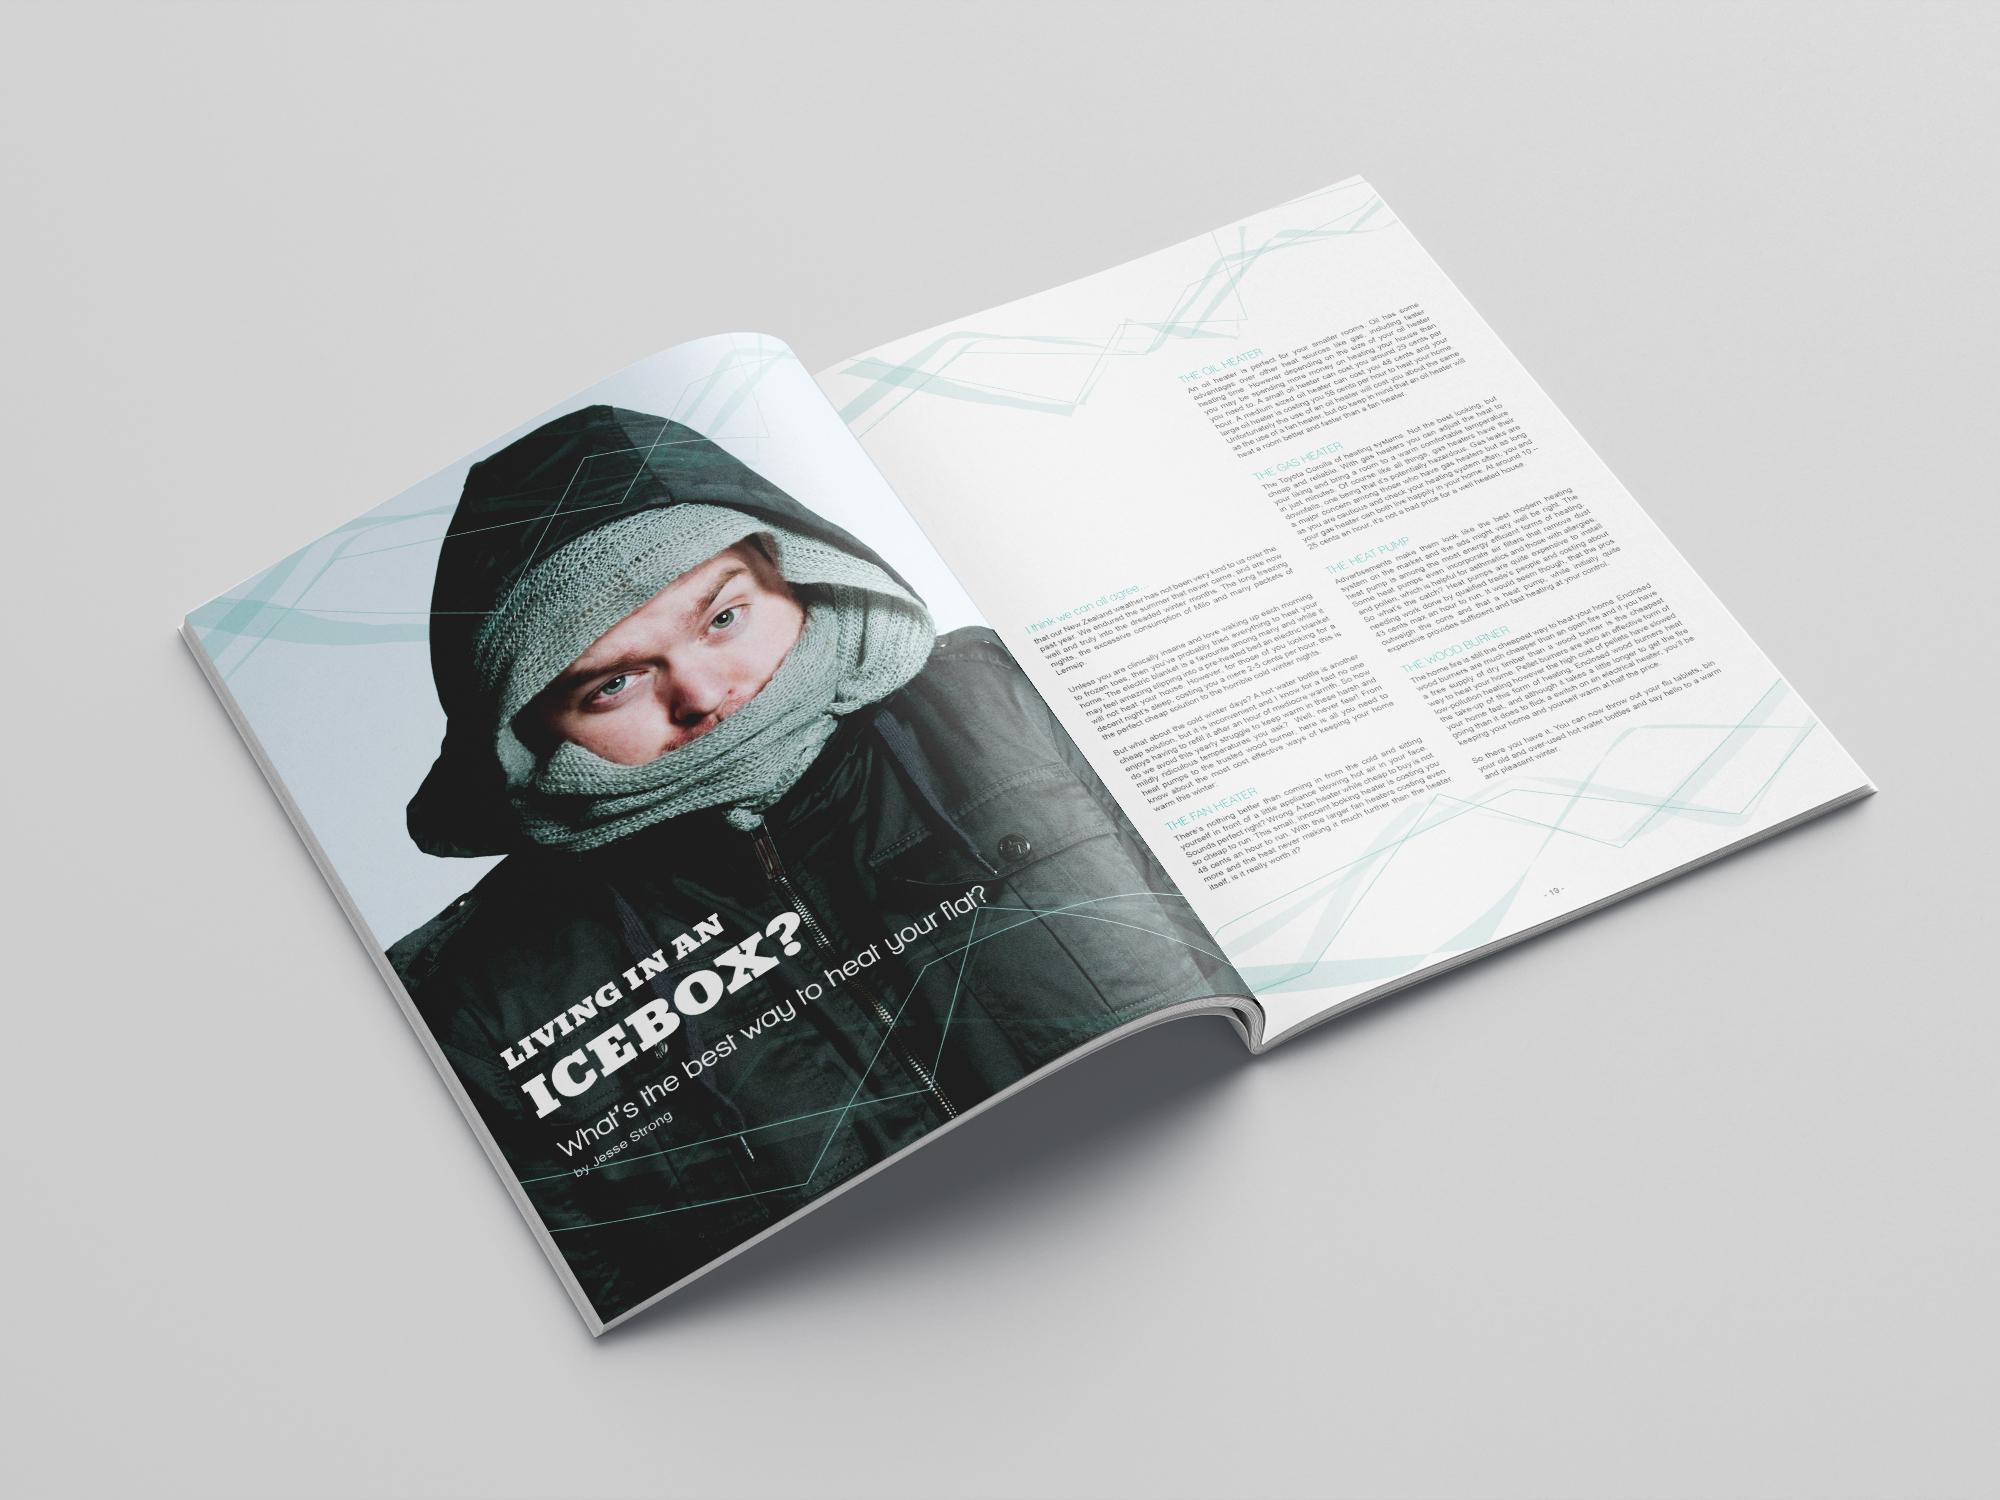 Crew-winter-2012-layout.jpg